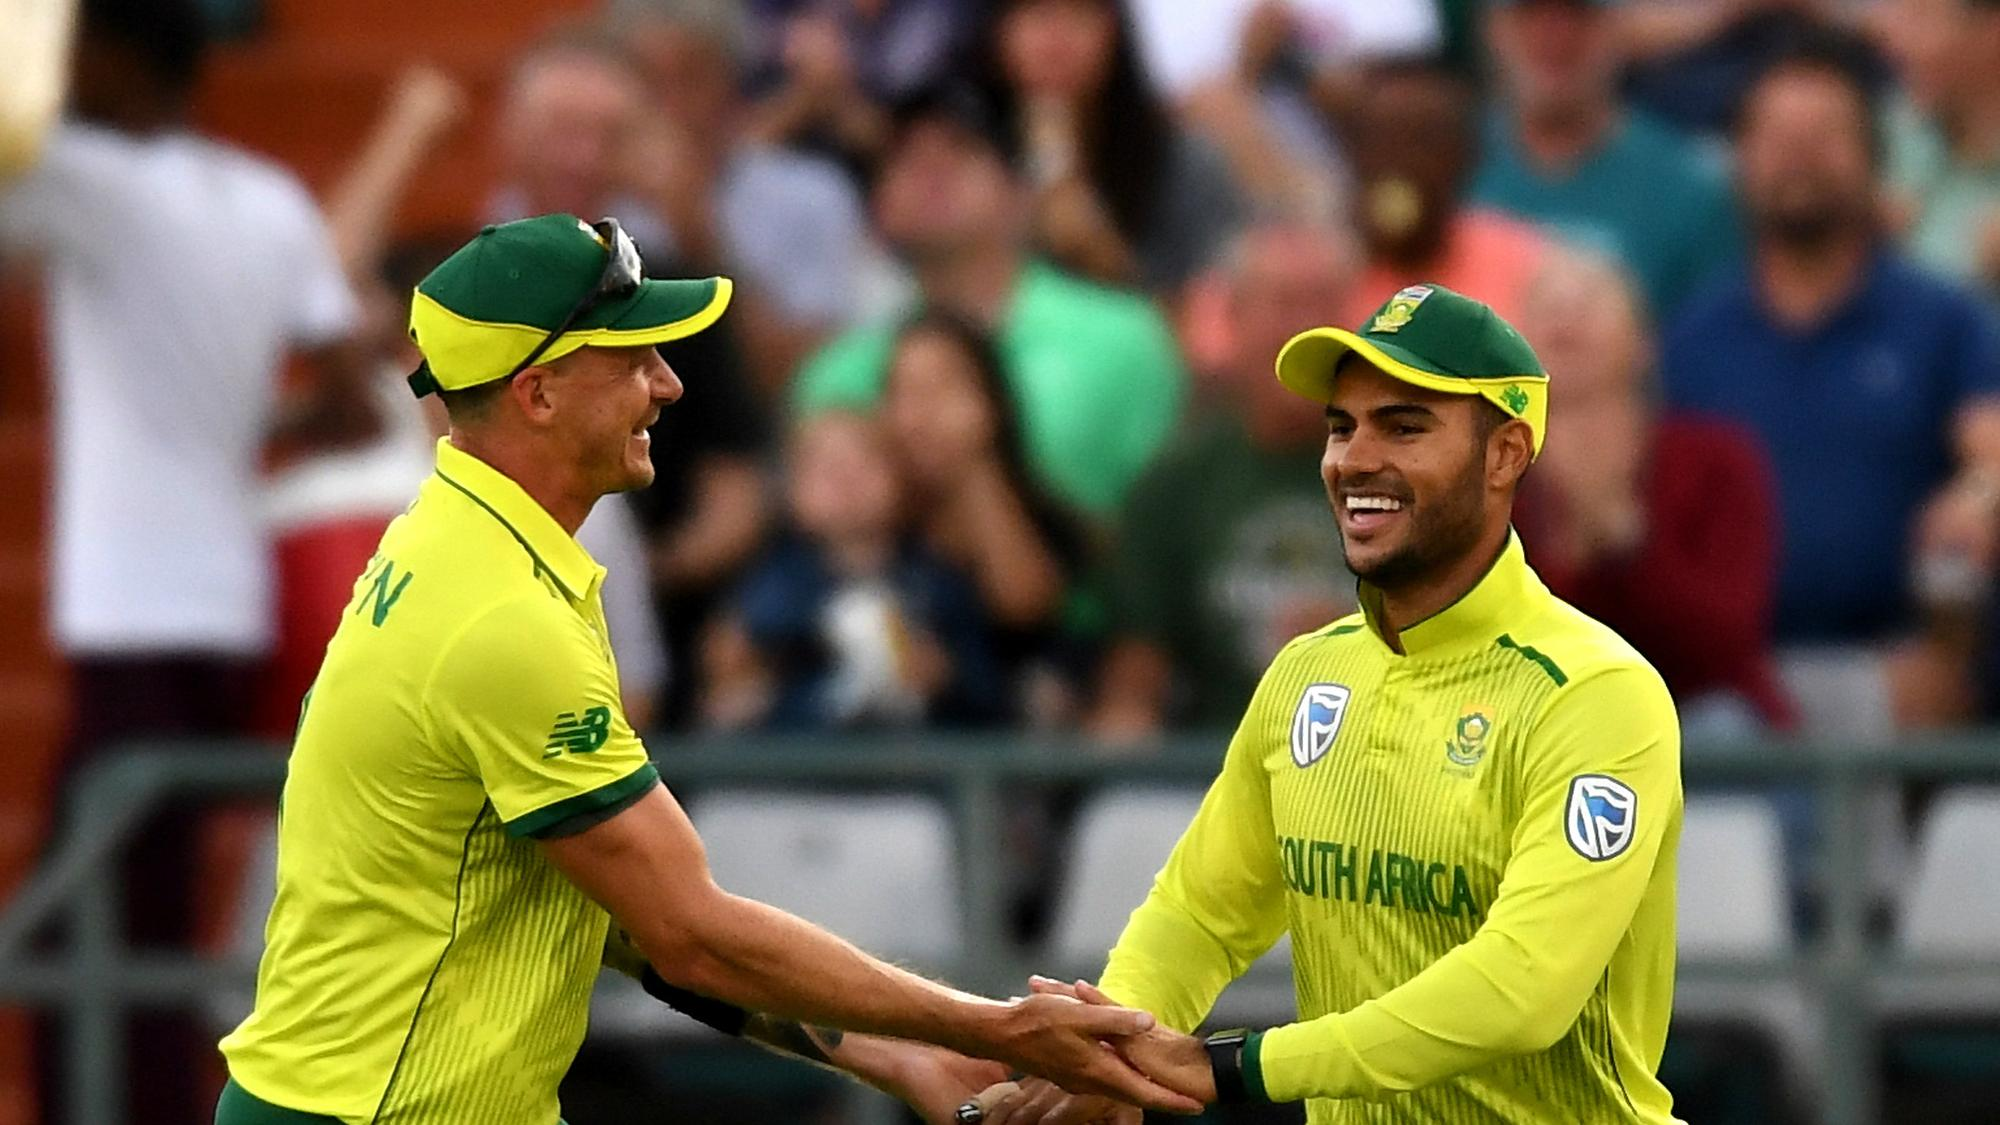 Hendricks, Phehlukwayo achieve career-best T20I rankings